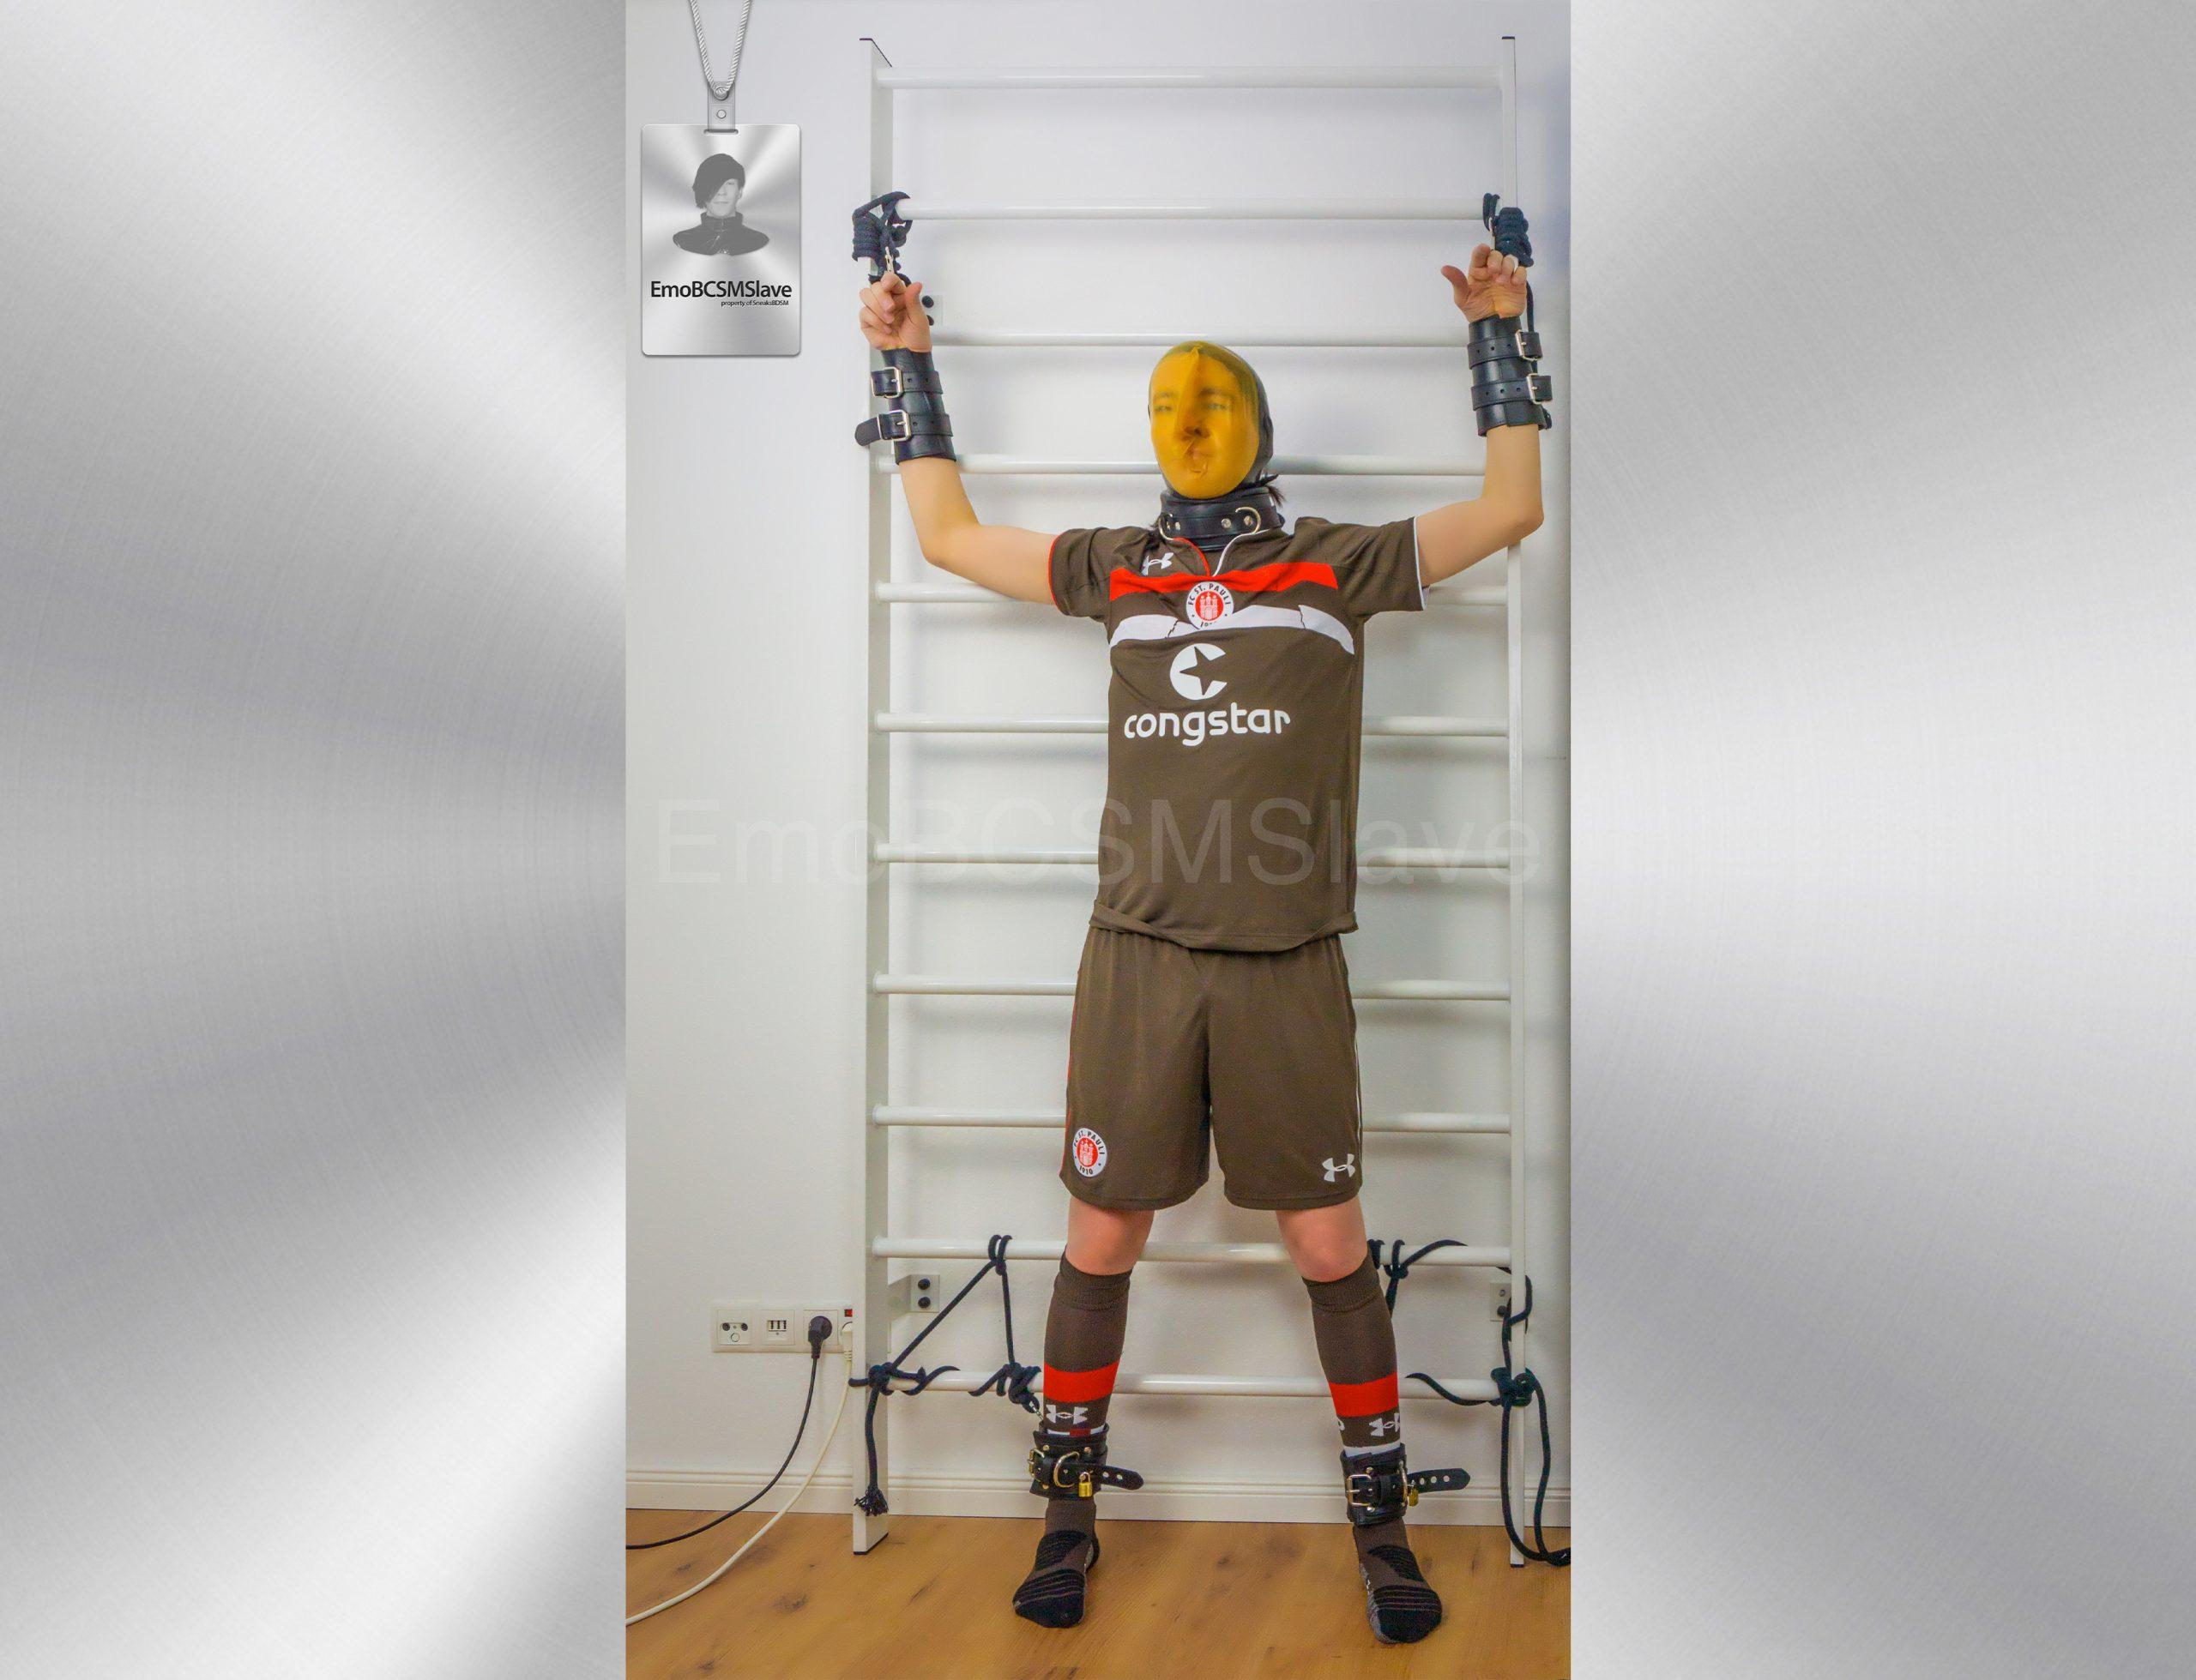 Soccer EmoBCSMSlave tied to wall bars and vacuum mask